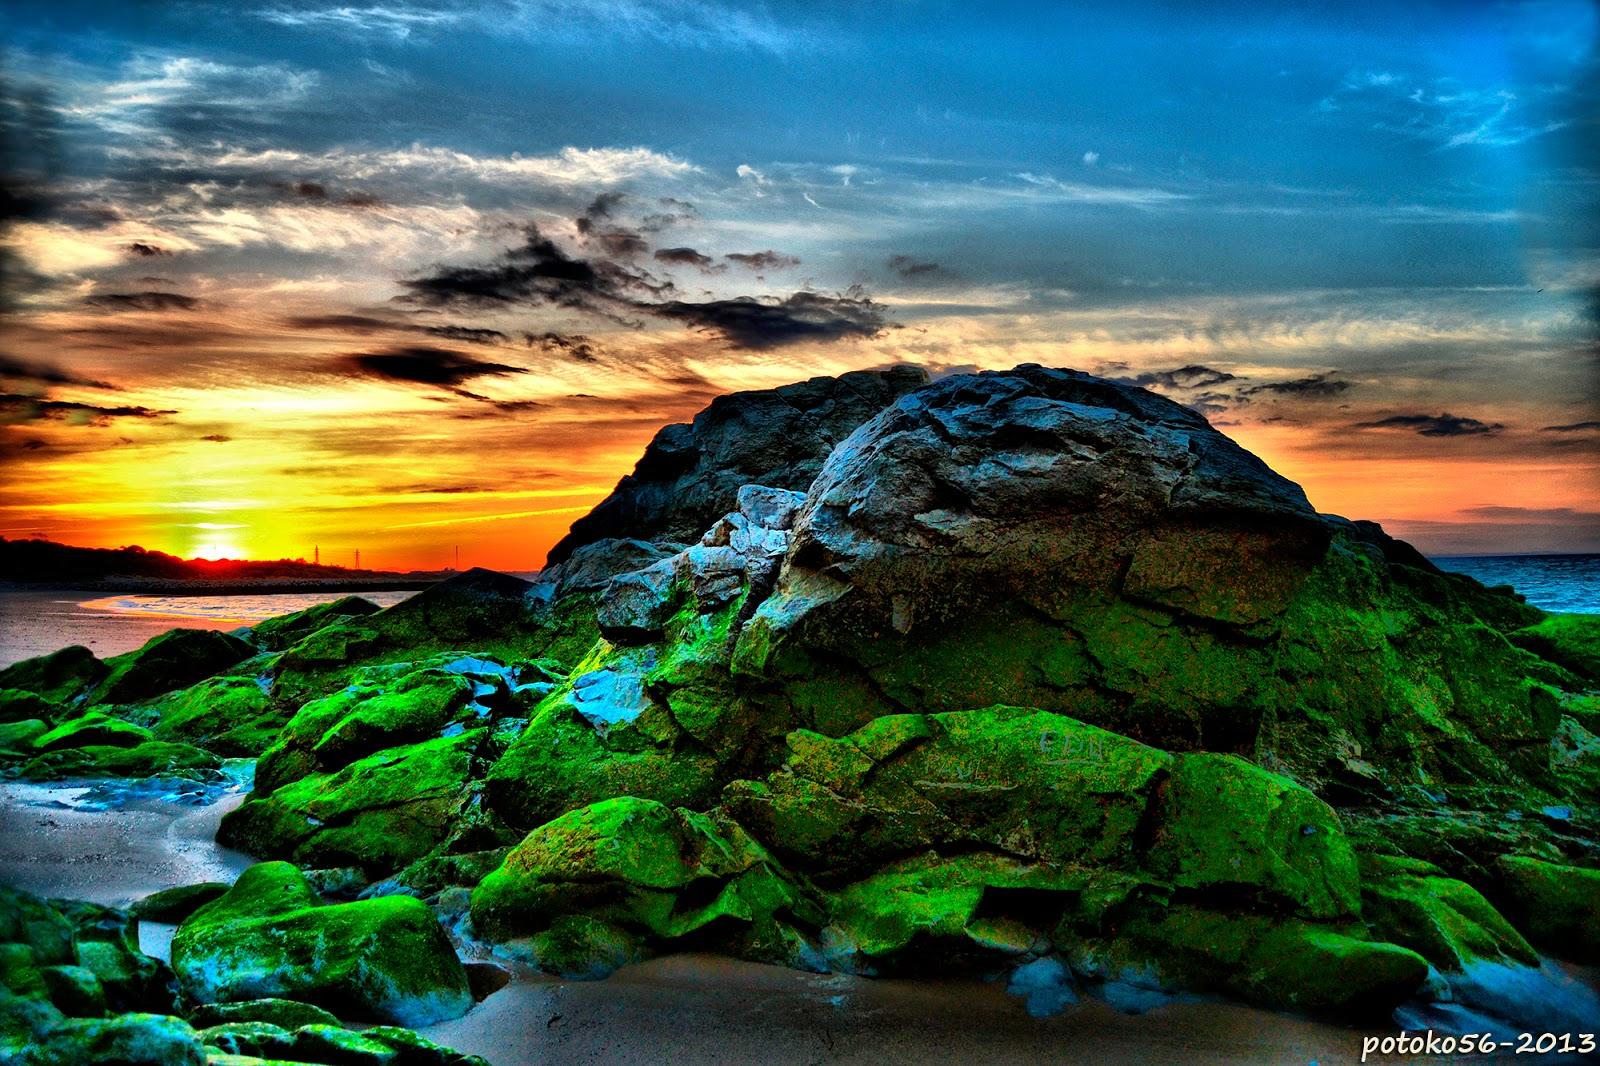 Rocas de barro como testigos del amanecer